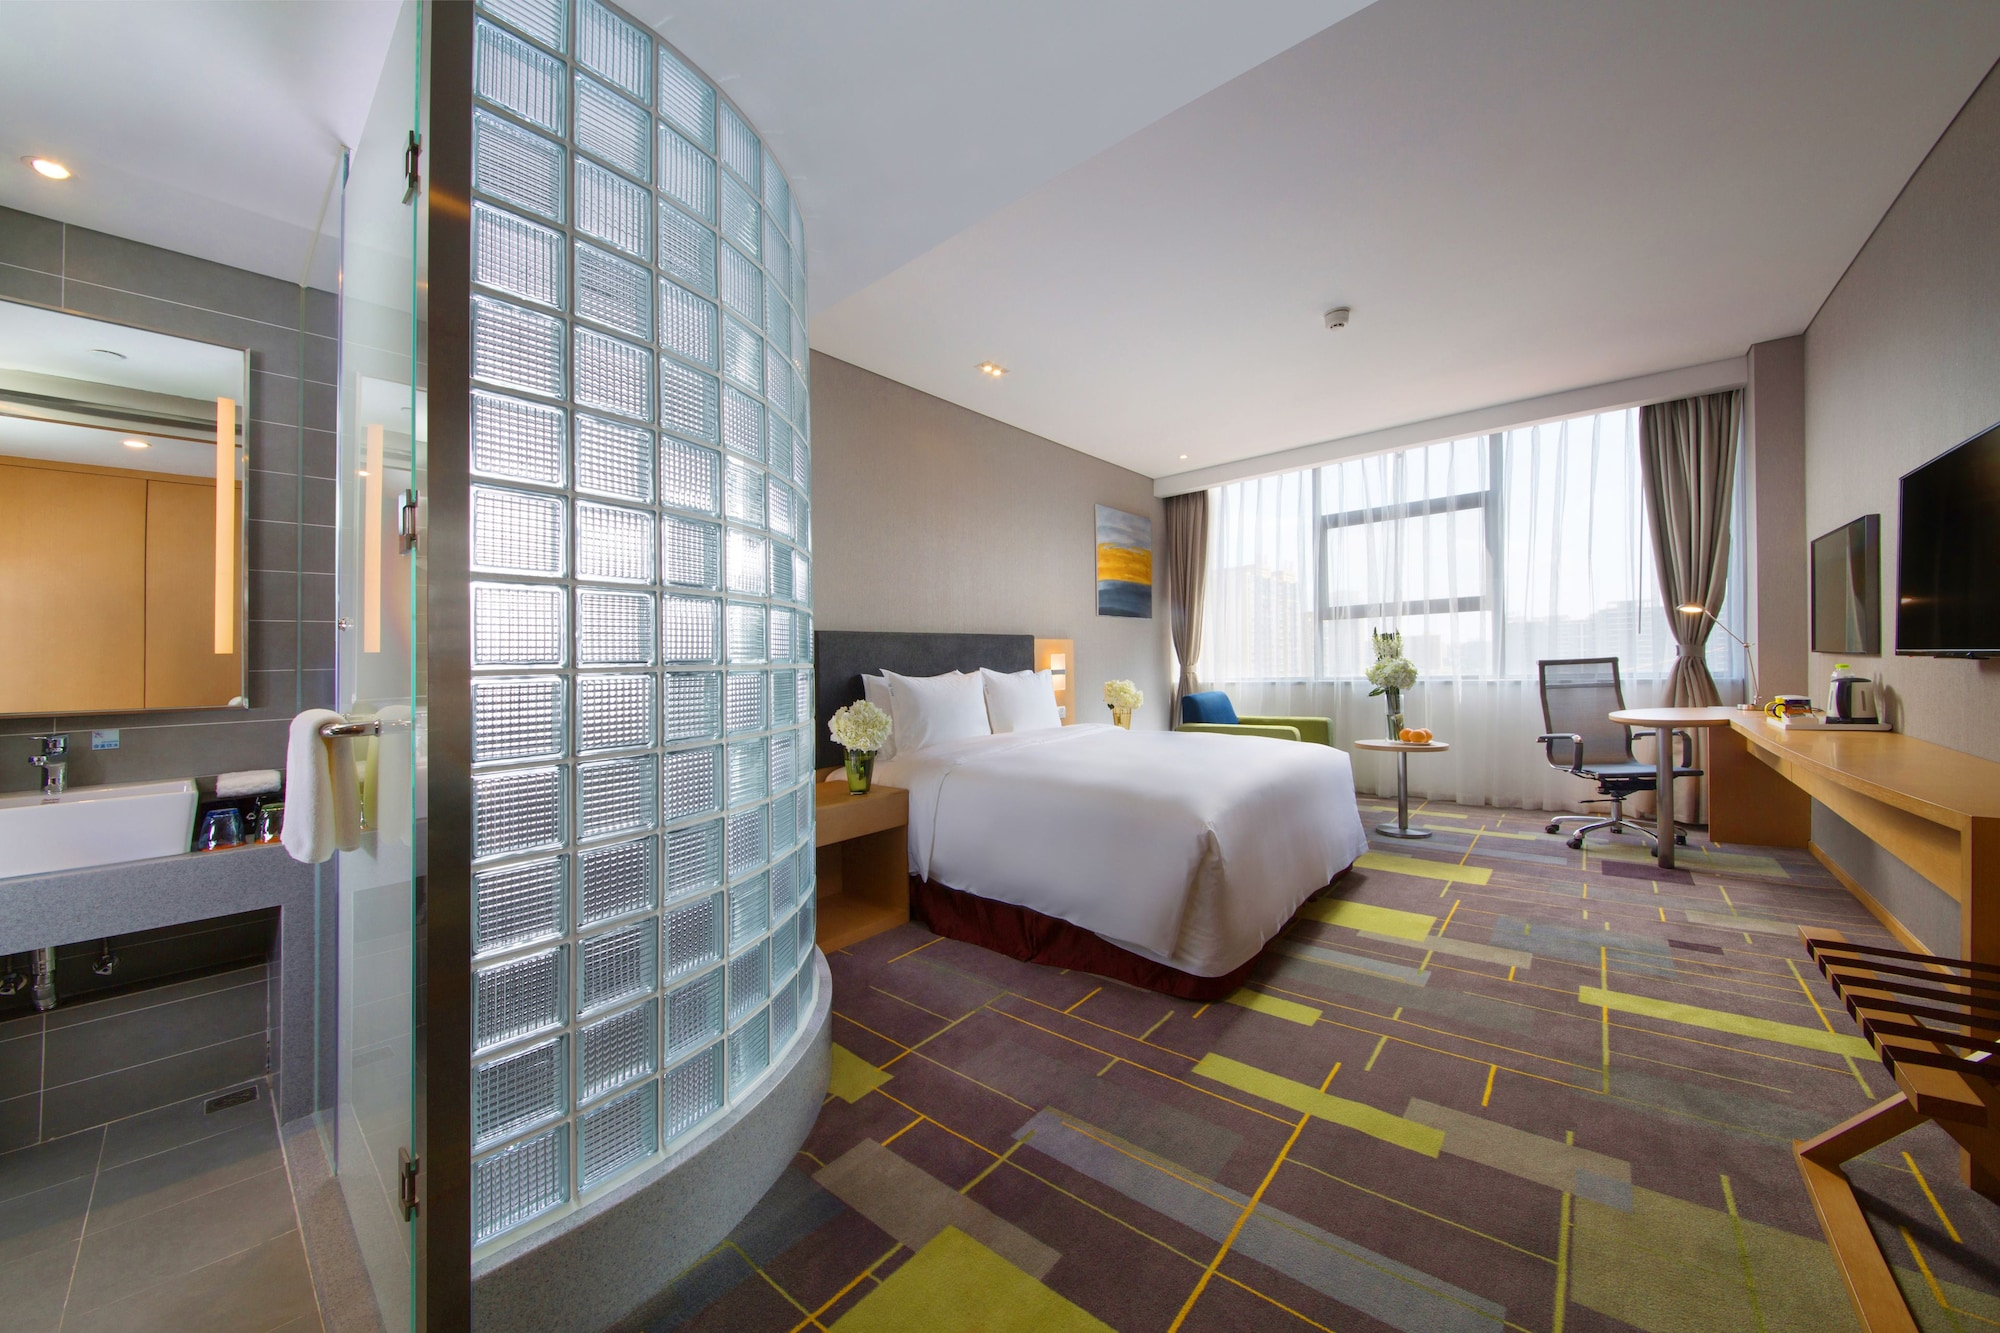 Holiday Inn Express Chengdu Dafeng, Chengdu